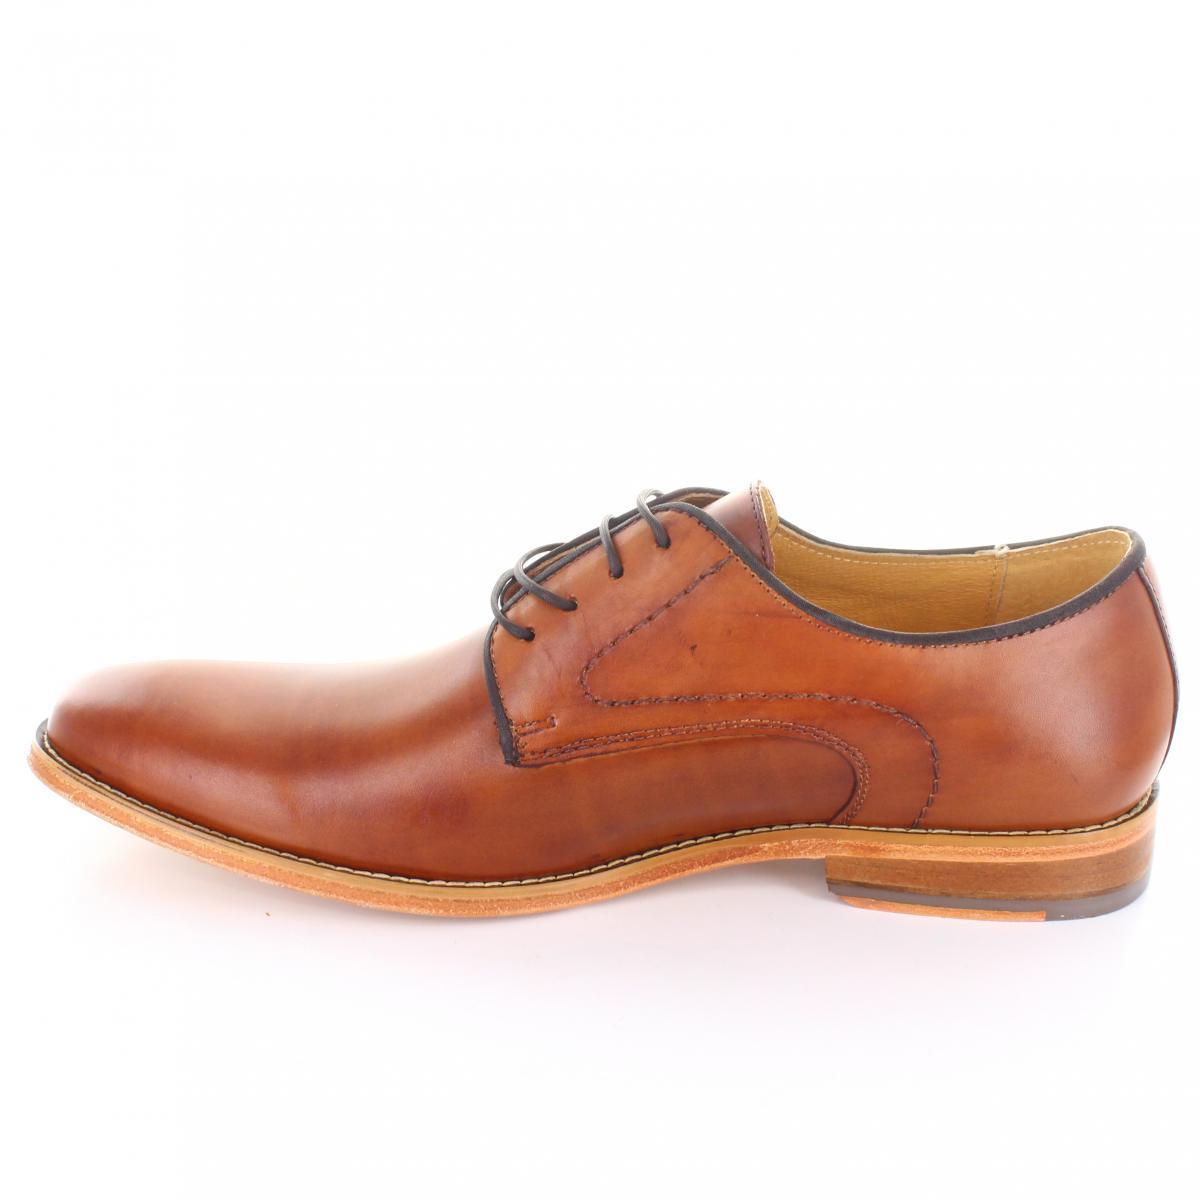 49abd5c6 Zapato marca Brantano modelo JR8800 Color Miel